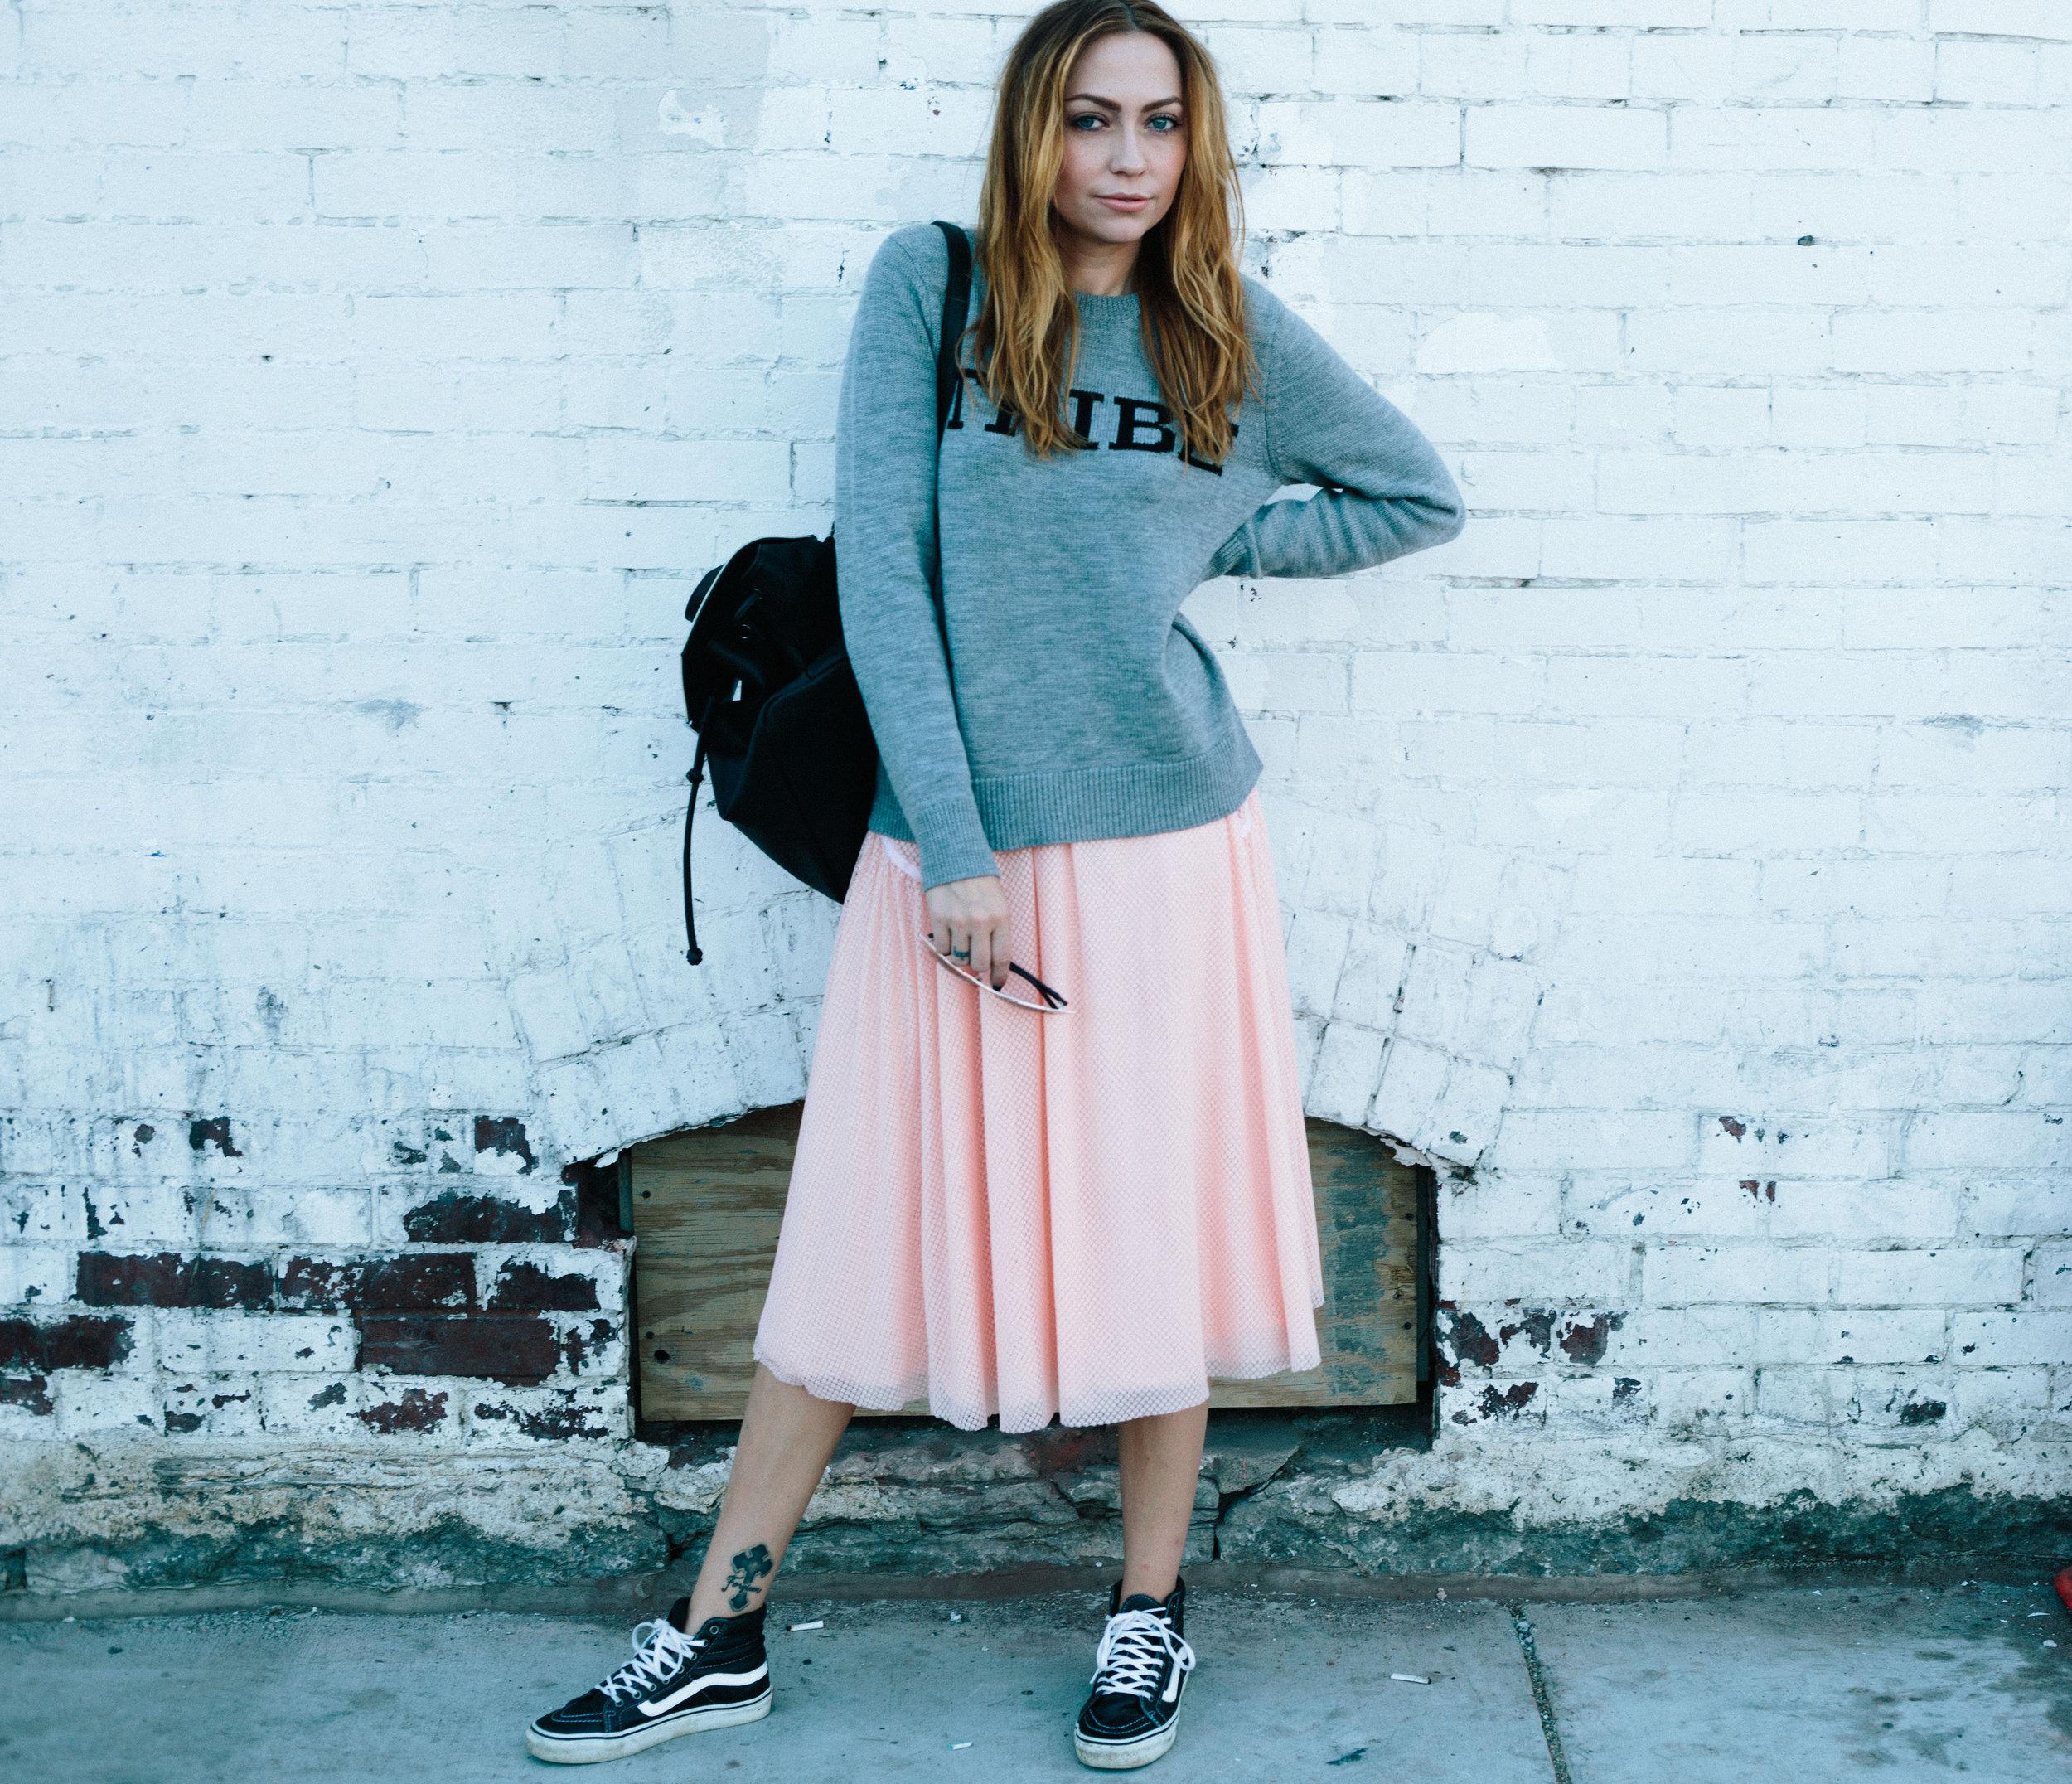 Top - A.L.C.  |  Skirt - Nastygal  |  Shoes - Vans  |  Sunnies - Quay Australia  |  Bag - Danielle Nicole  ||  photos by Susannah Brittany